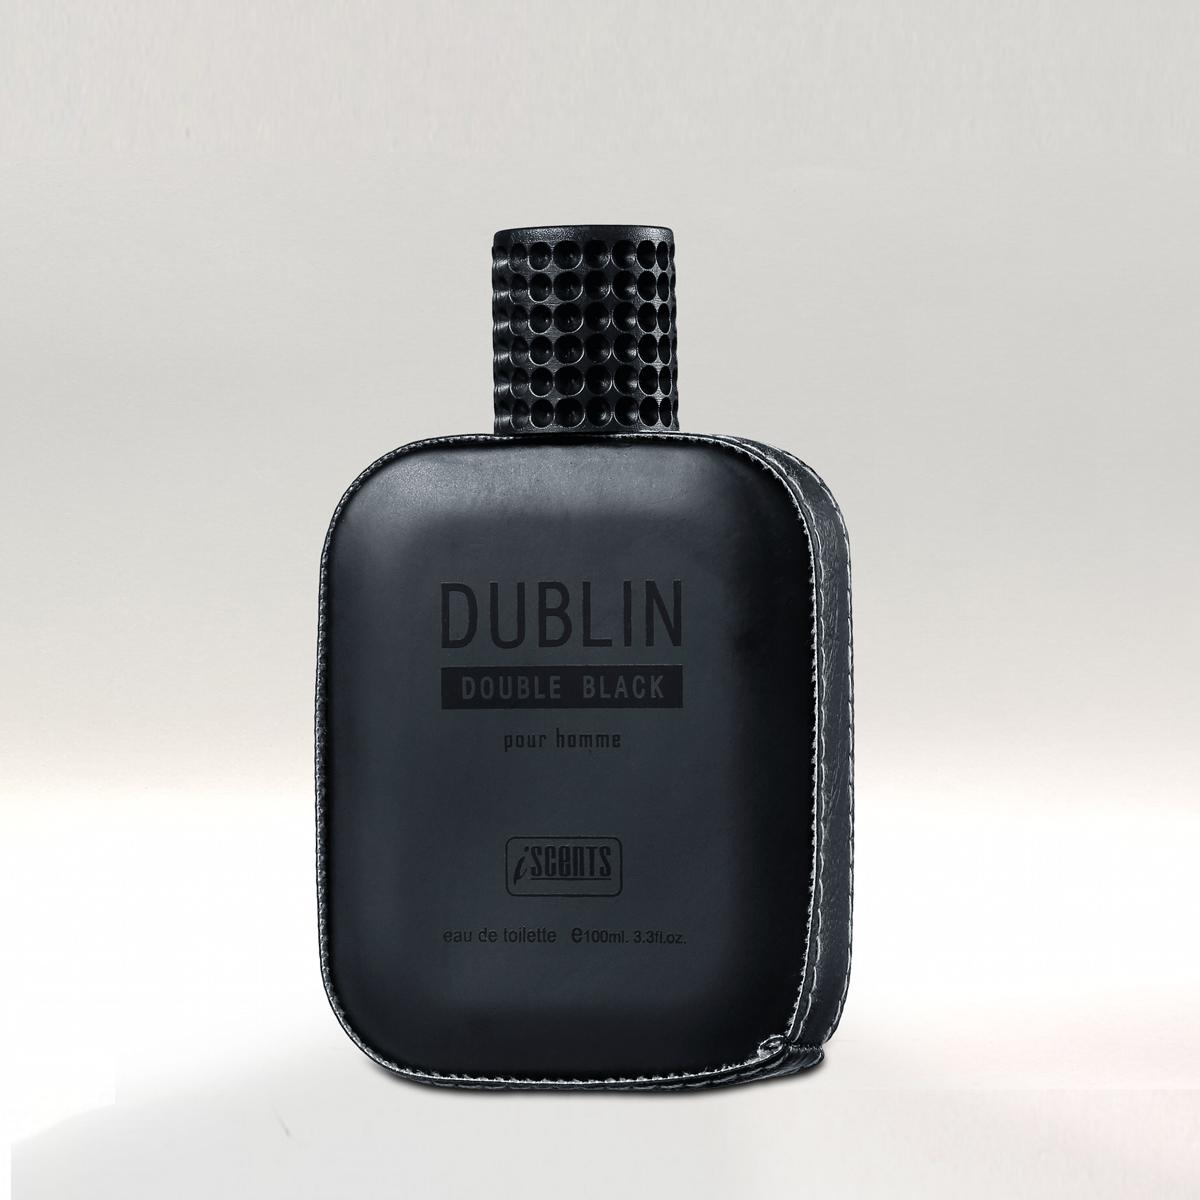 kit 3 perfumes, Noir gen, Dublin e Ferous Black I Scents